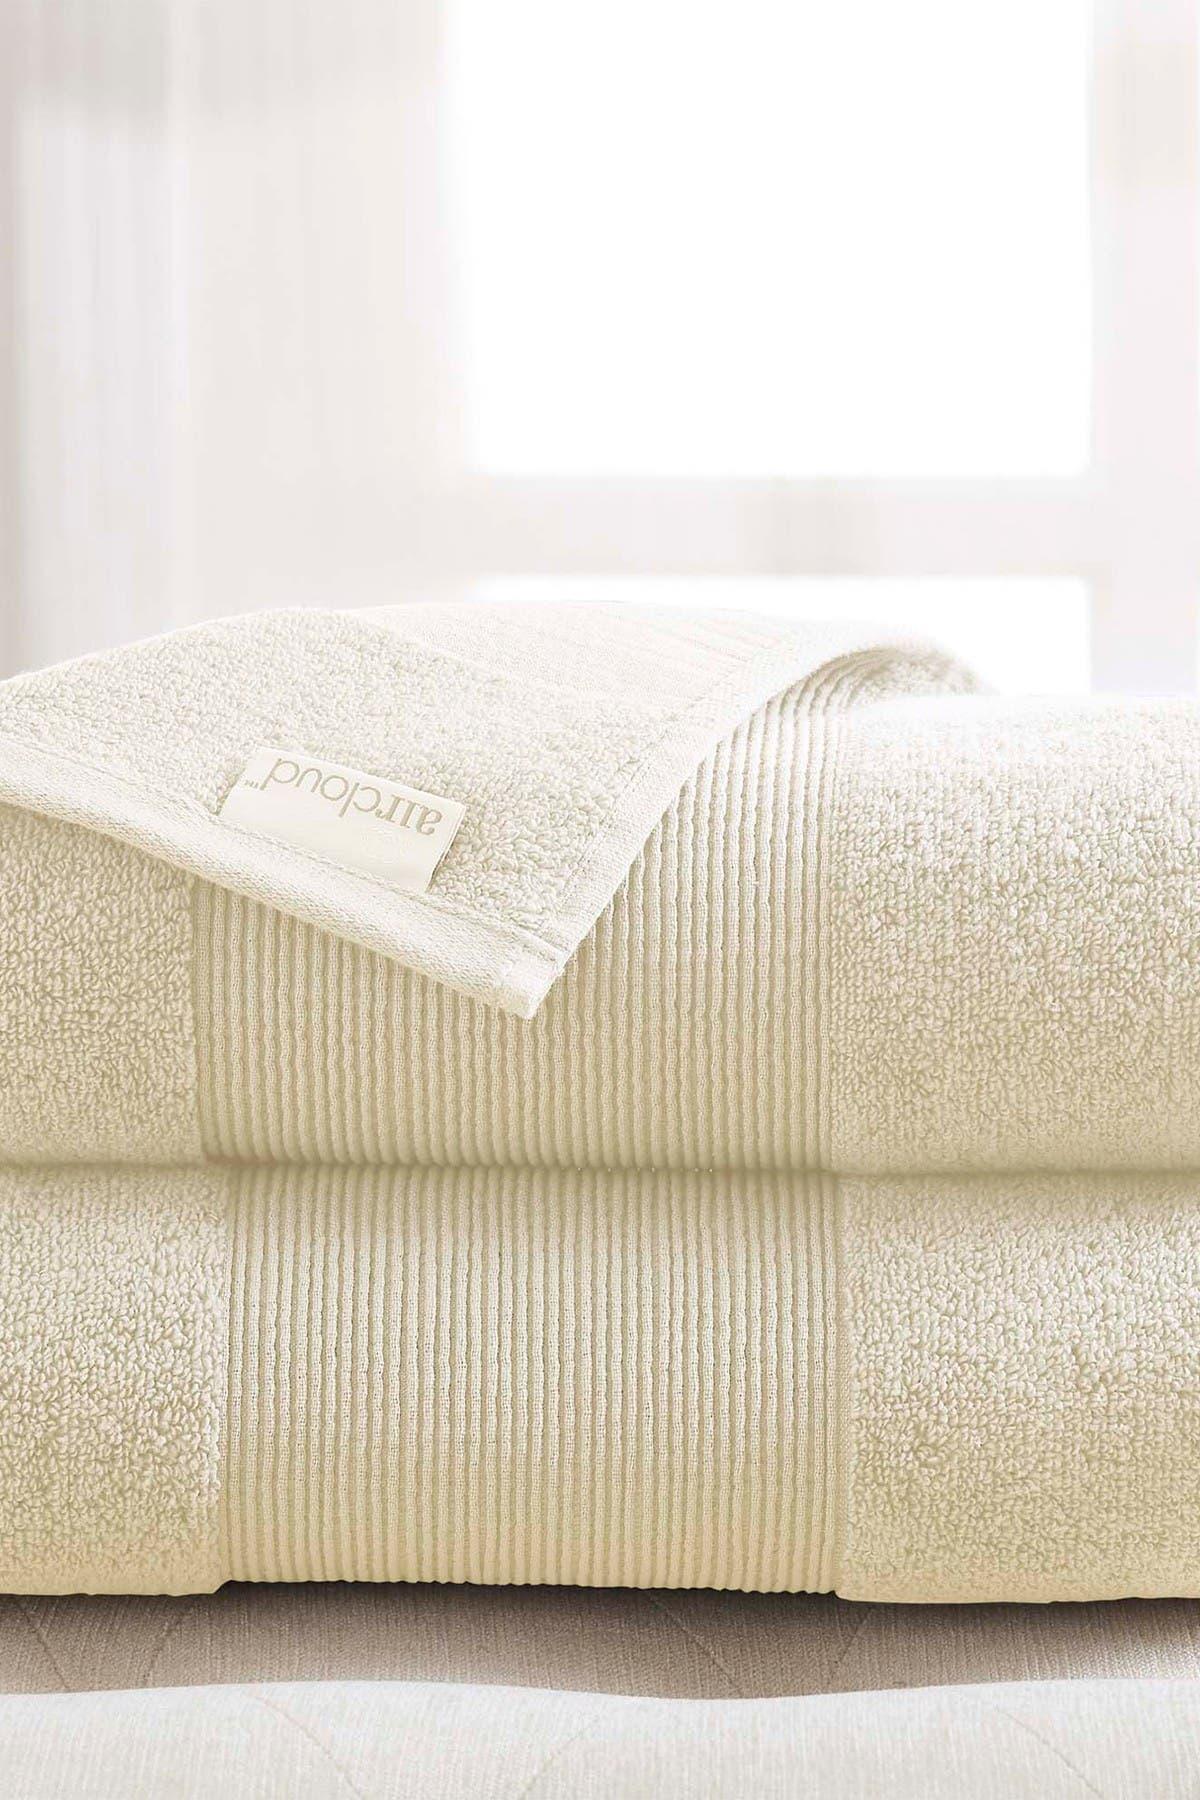 Image of Modern Threads Air Cloud Oversized Bath Sheet - Set of 2 - Ivory